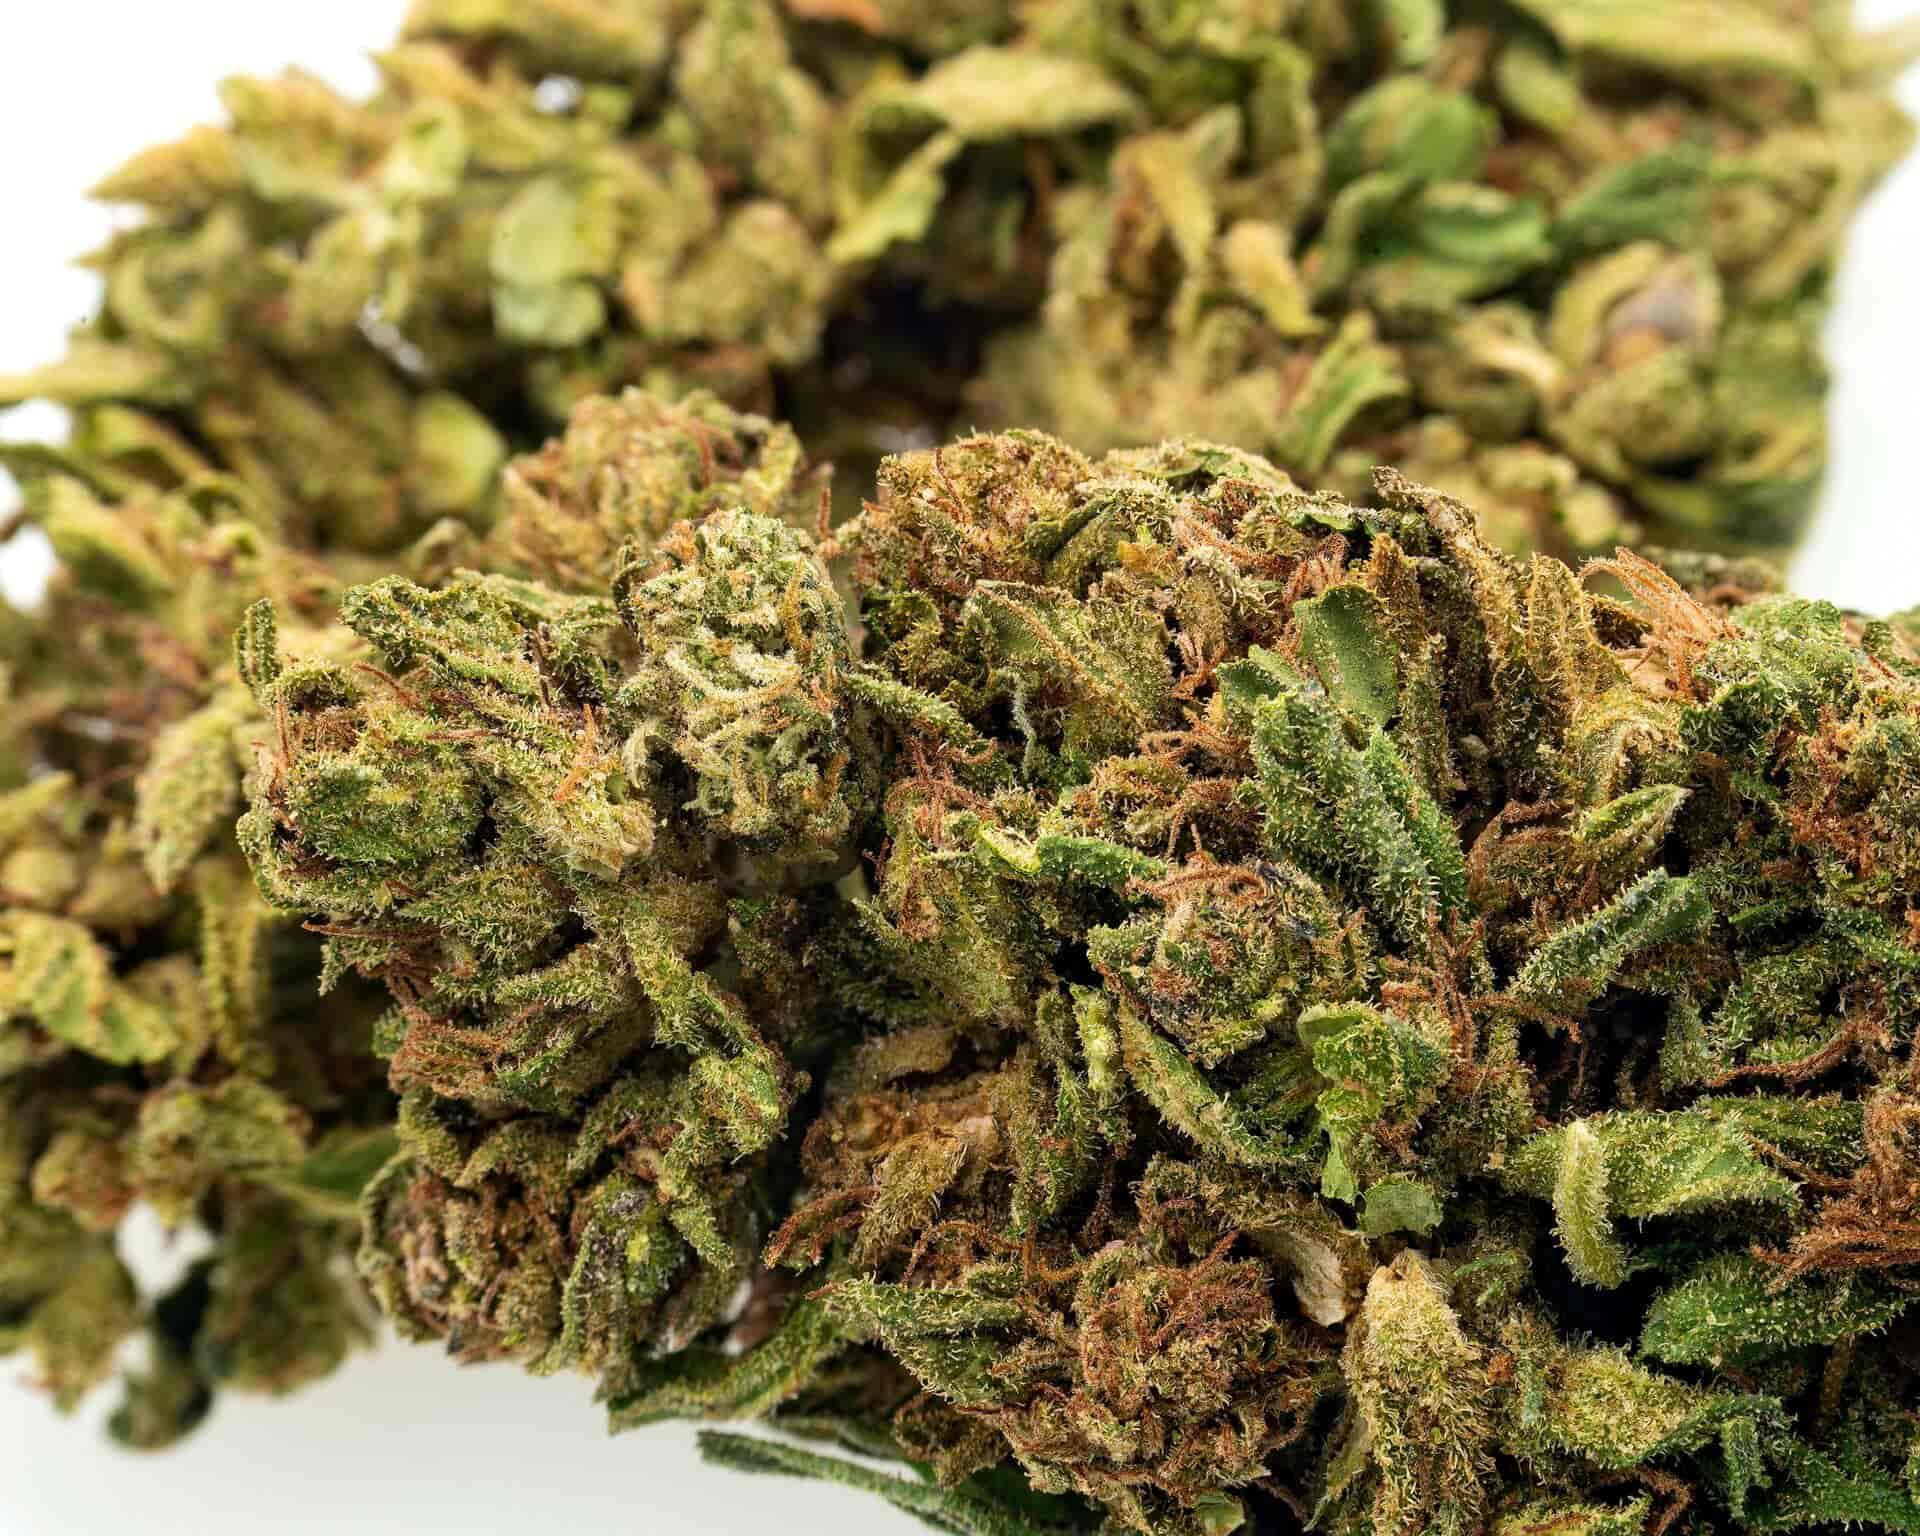 Super Lemon Haze CBD hemp flower for sale online